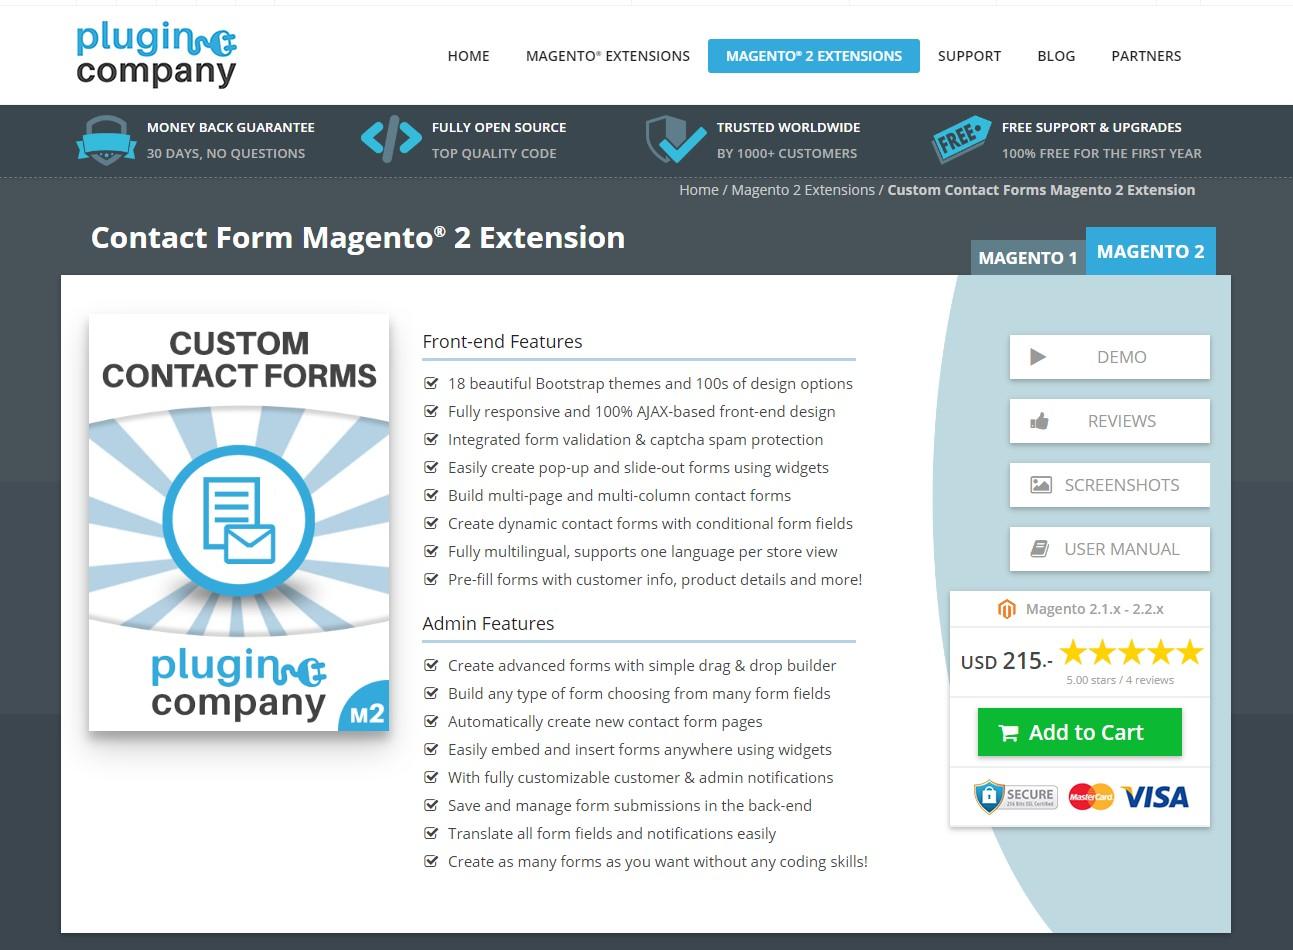 Contact Form Magento 2 Extension - Plugin Compan